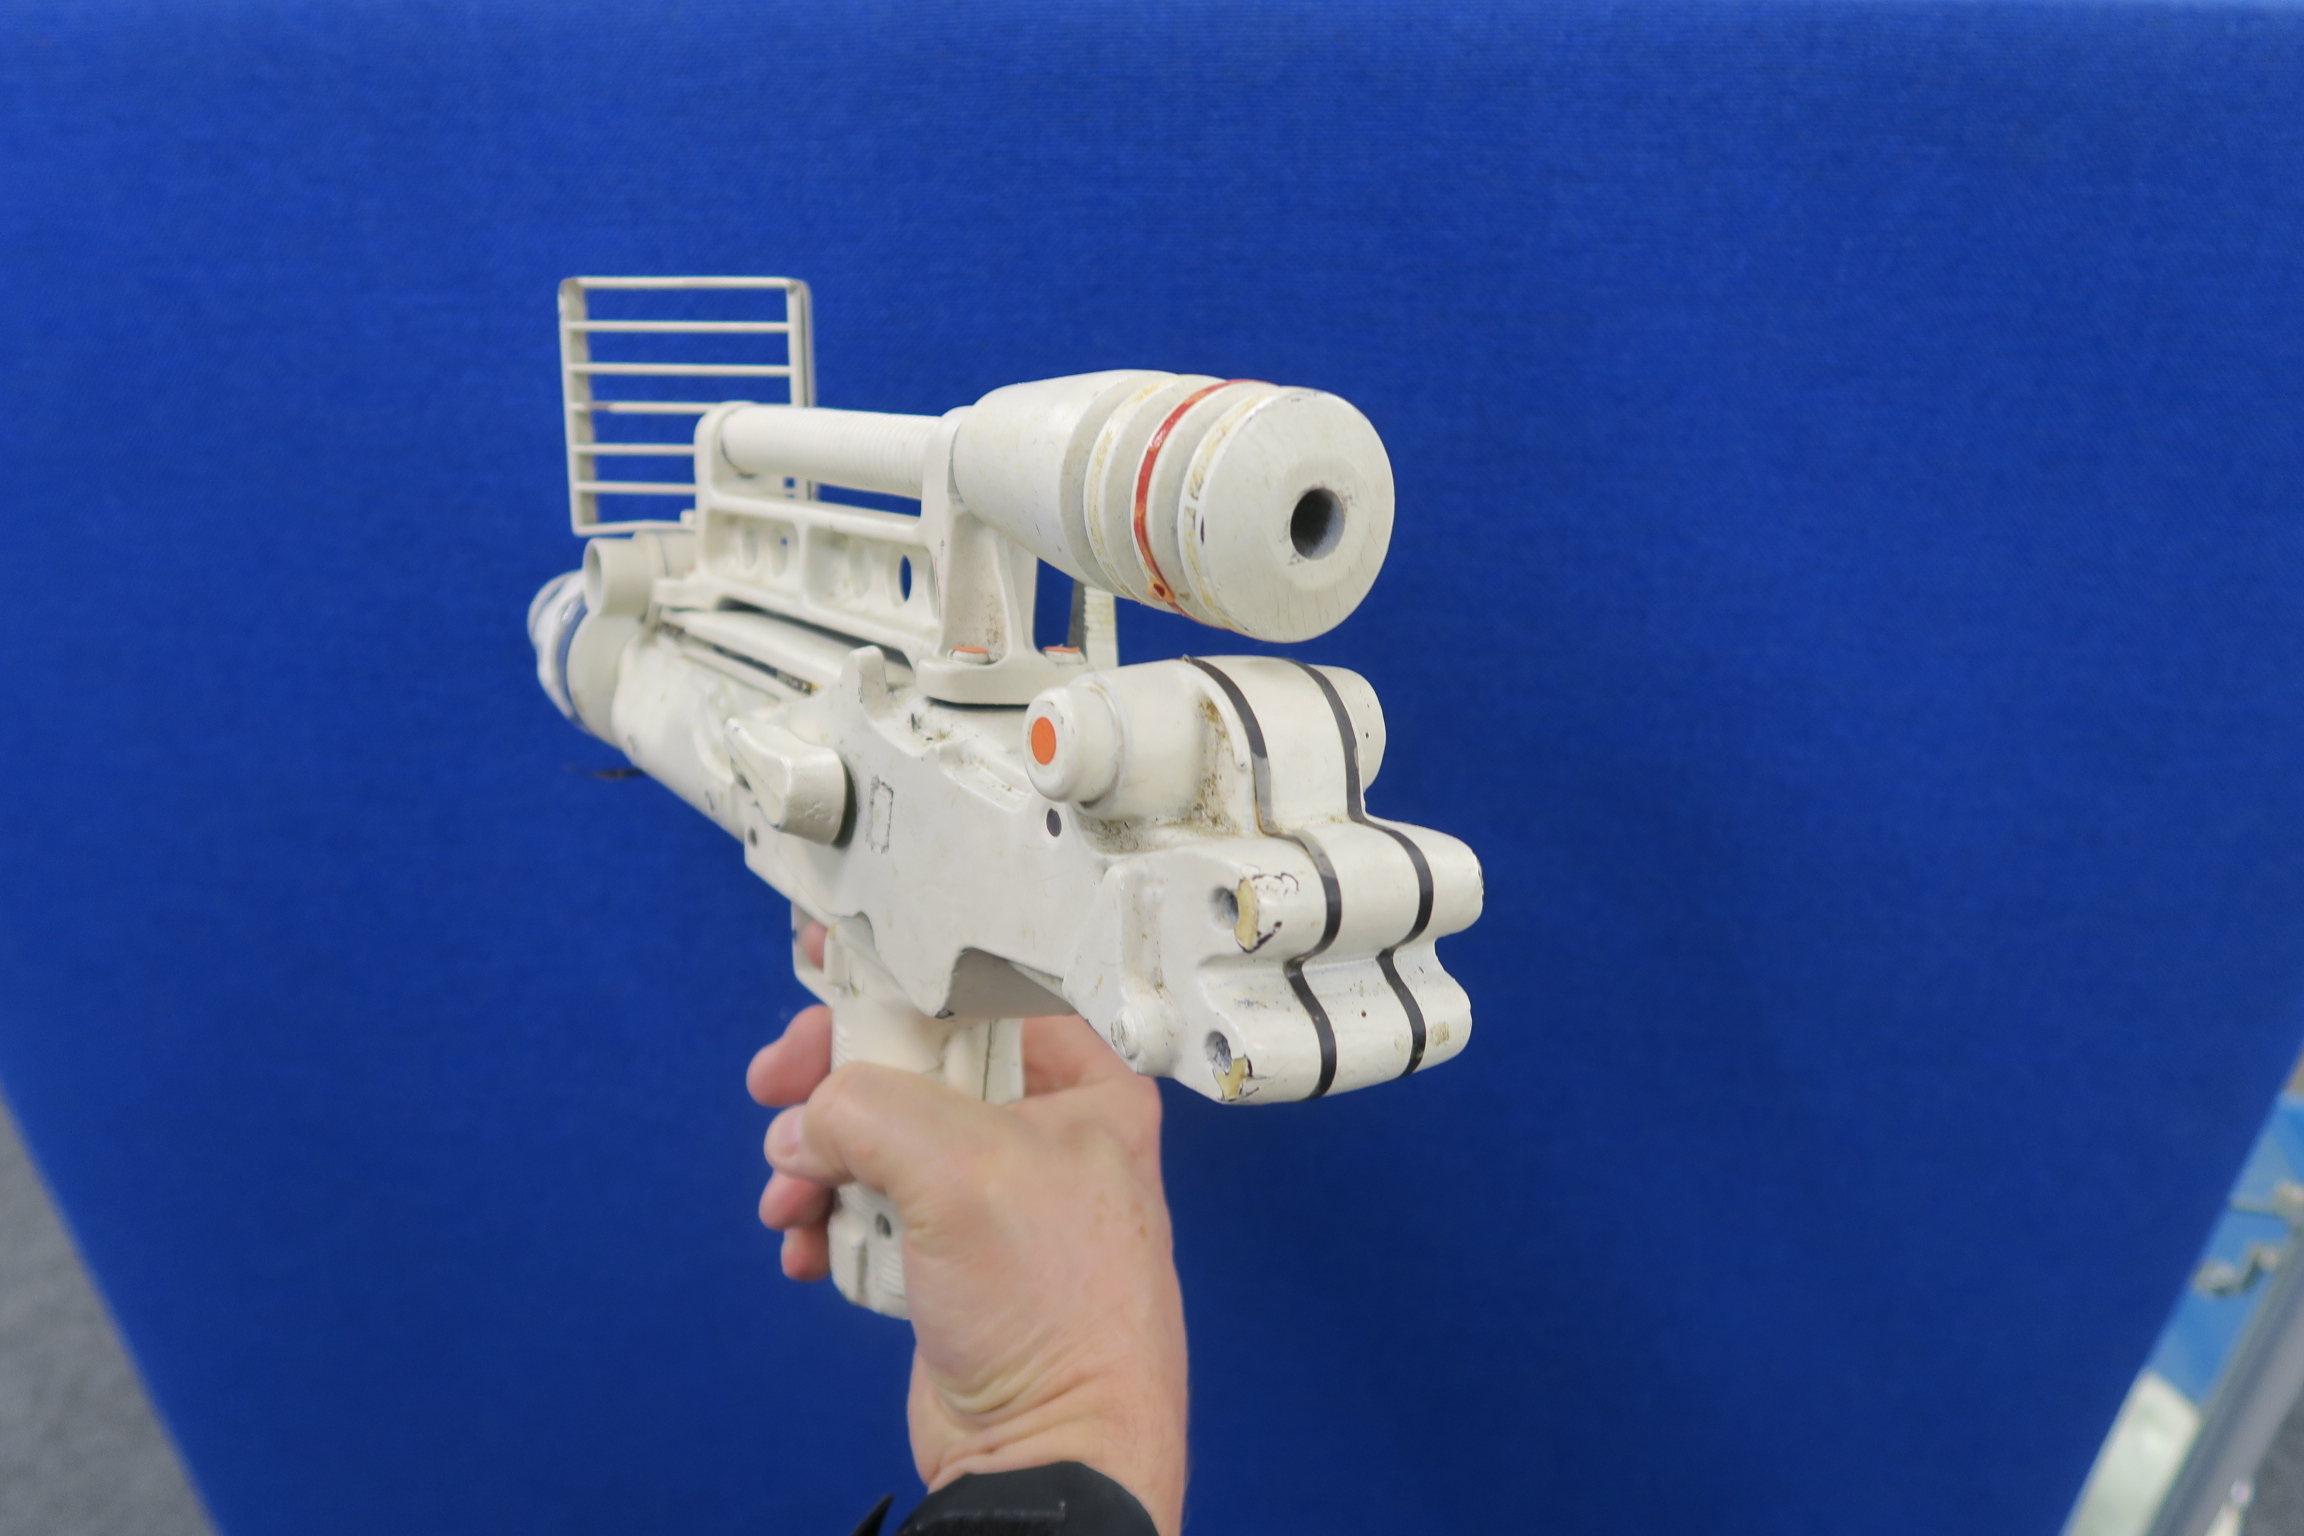 JAMES BOND 007 : Moonraker laser rifle created especially for this futuristic James Bond 1979 film. - Image 7 of 7